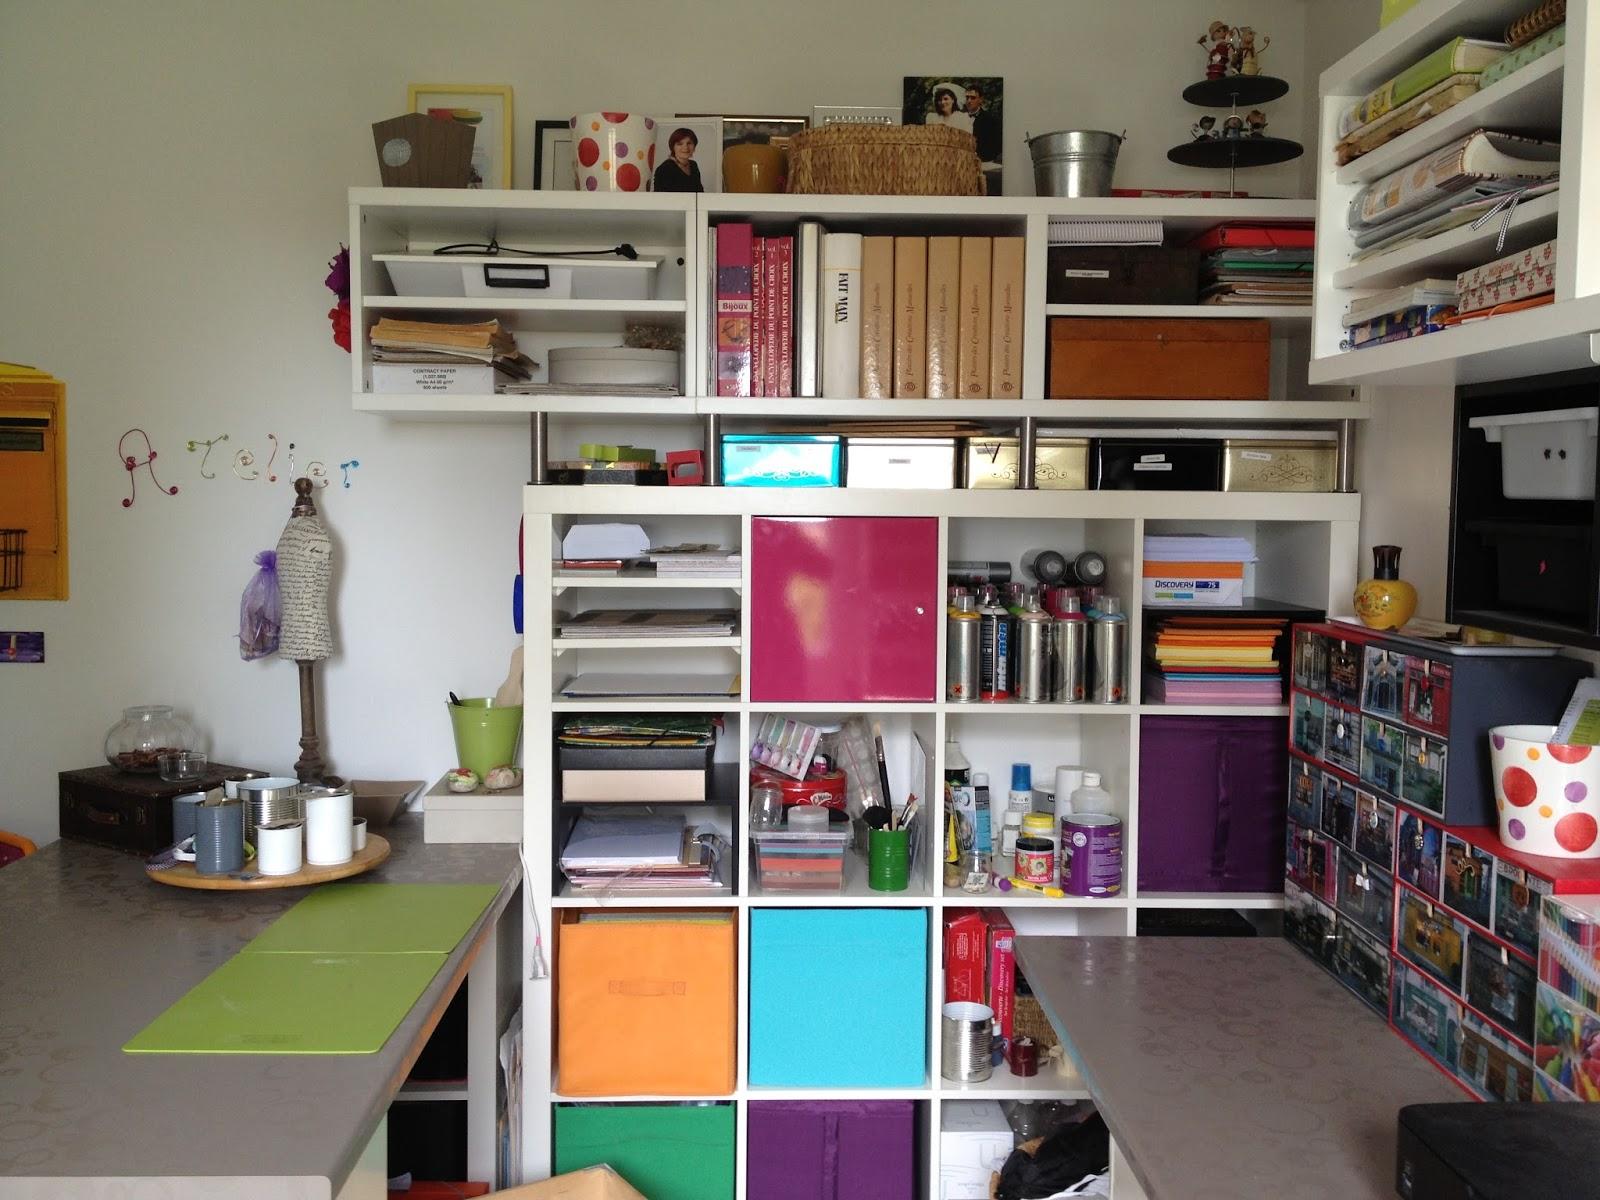 Les diy de suzan mon atelier bureau - Organisation placard cuisine ...